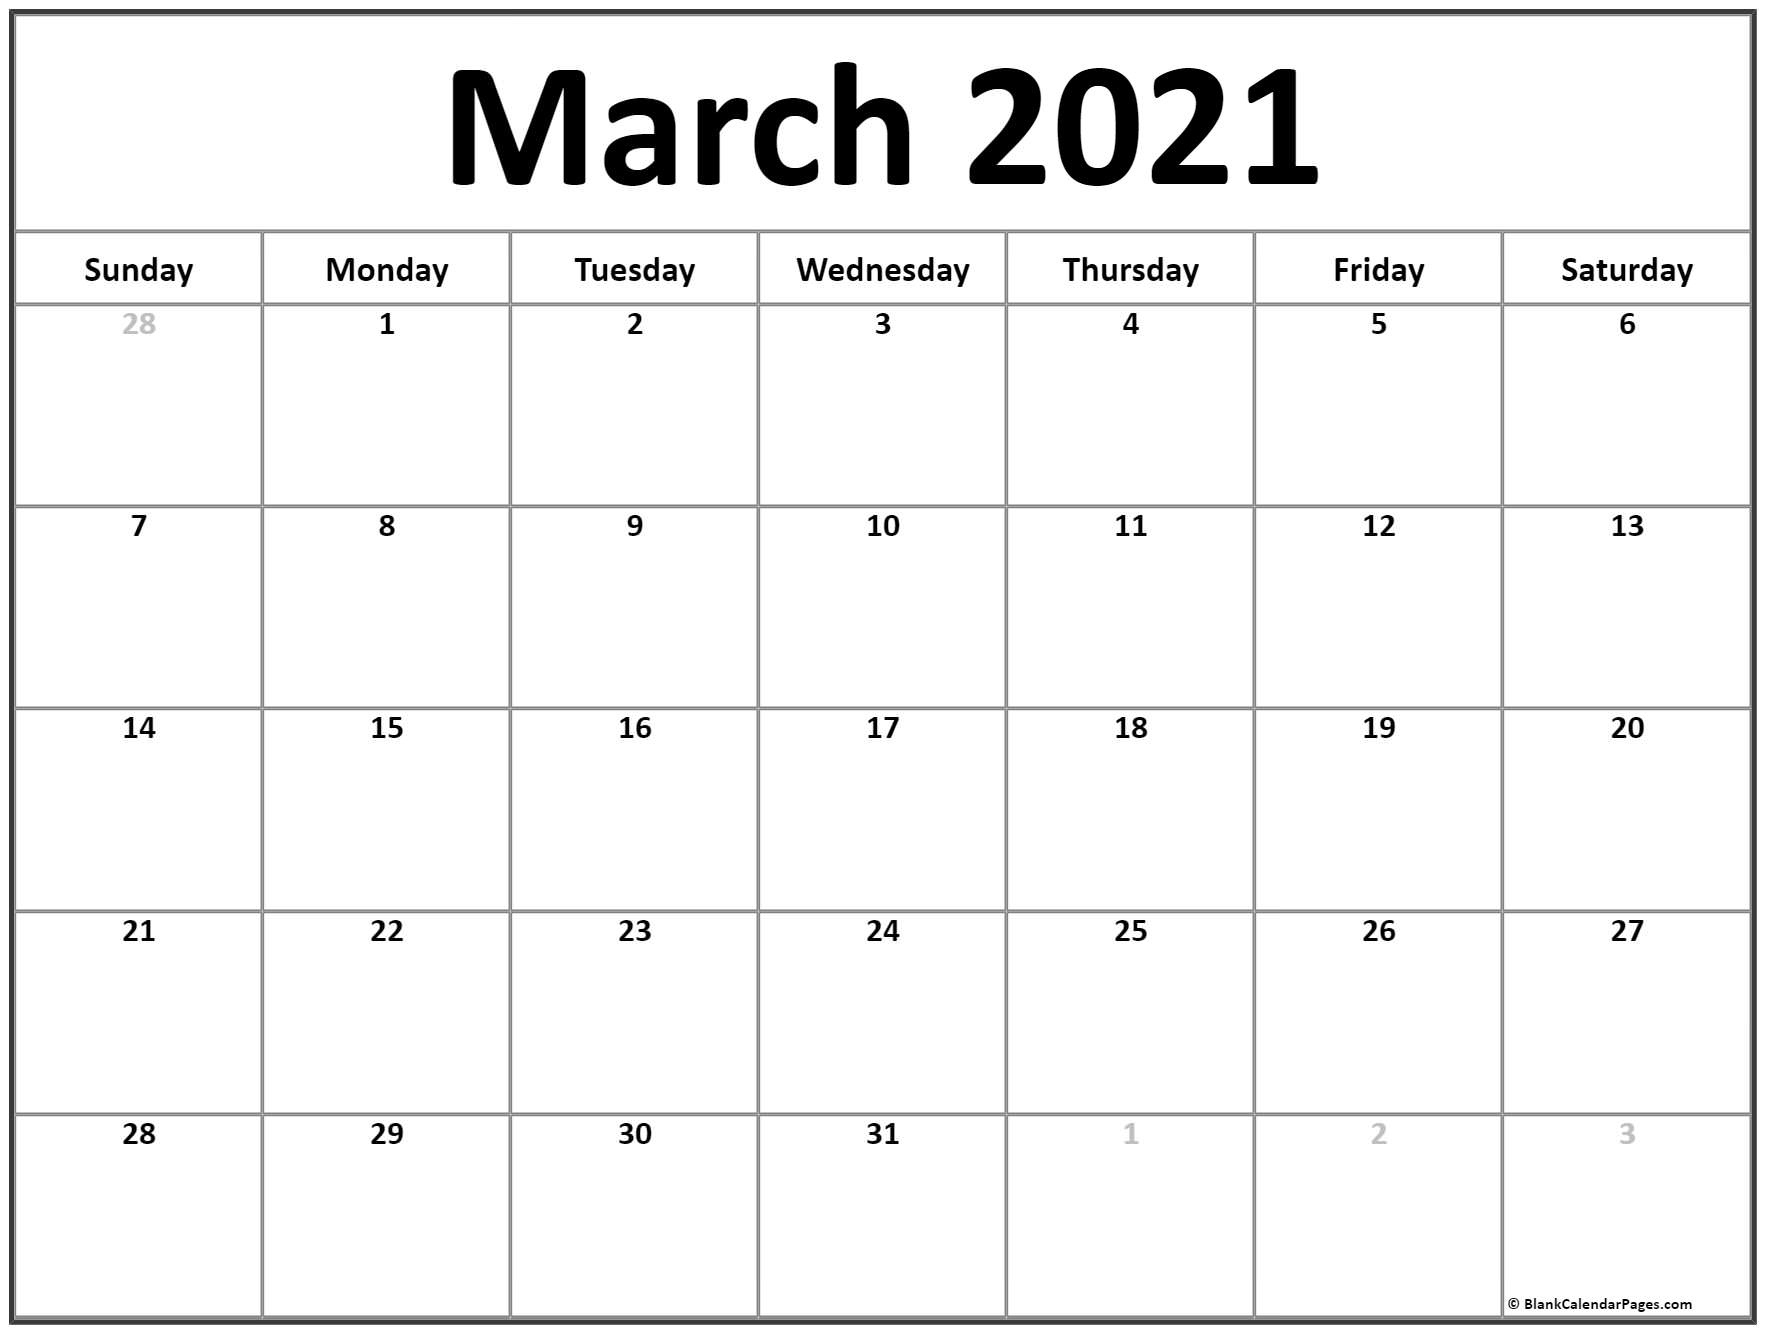 March 2021 Calendar | Free Printable Calendar Blank July 2021 Calendar Printable